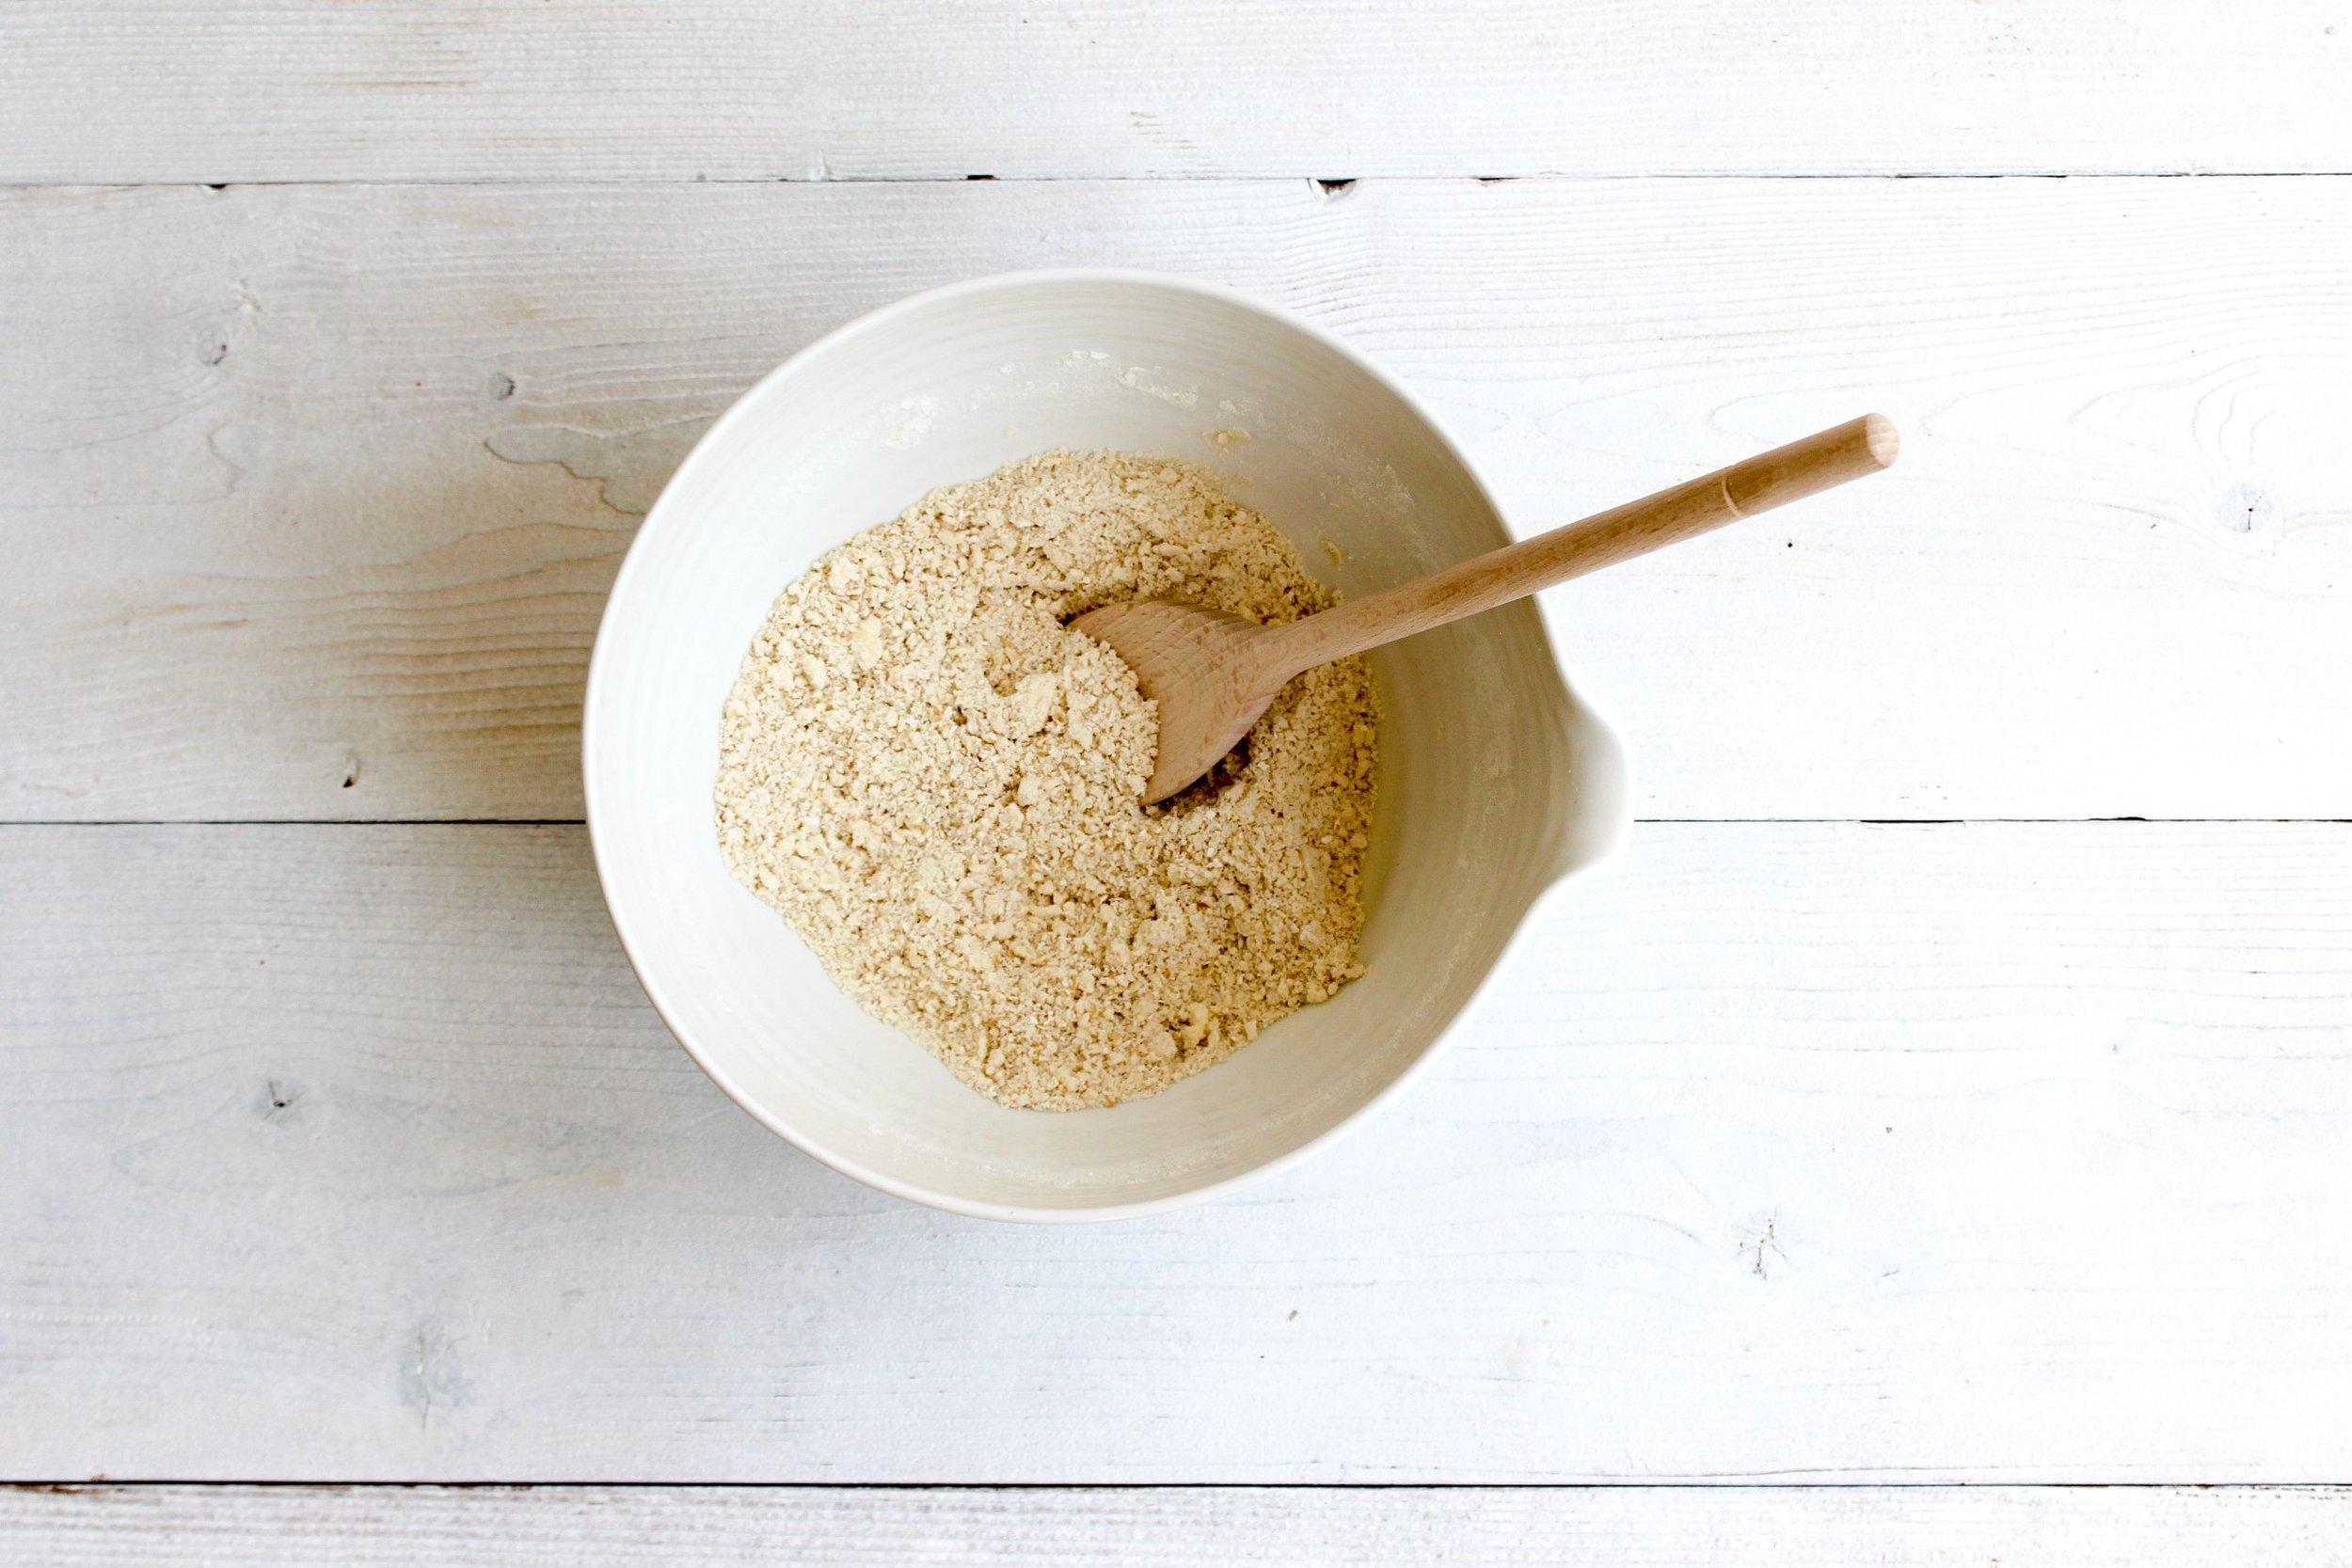 Stir through blitzed oats